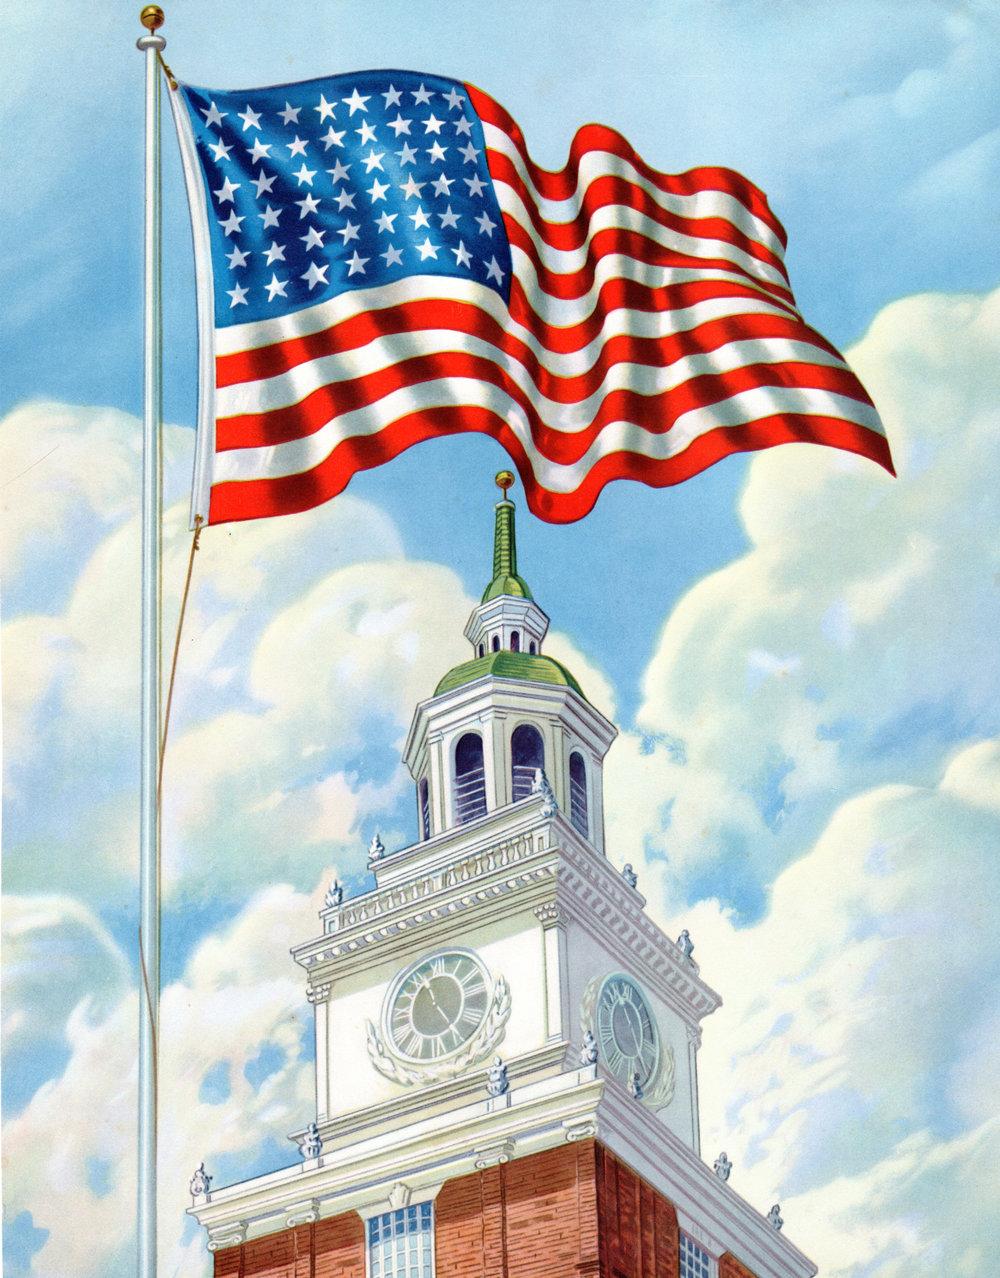 U.S. Landmarks, Memorials, Buildings, etc.